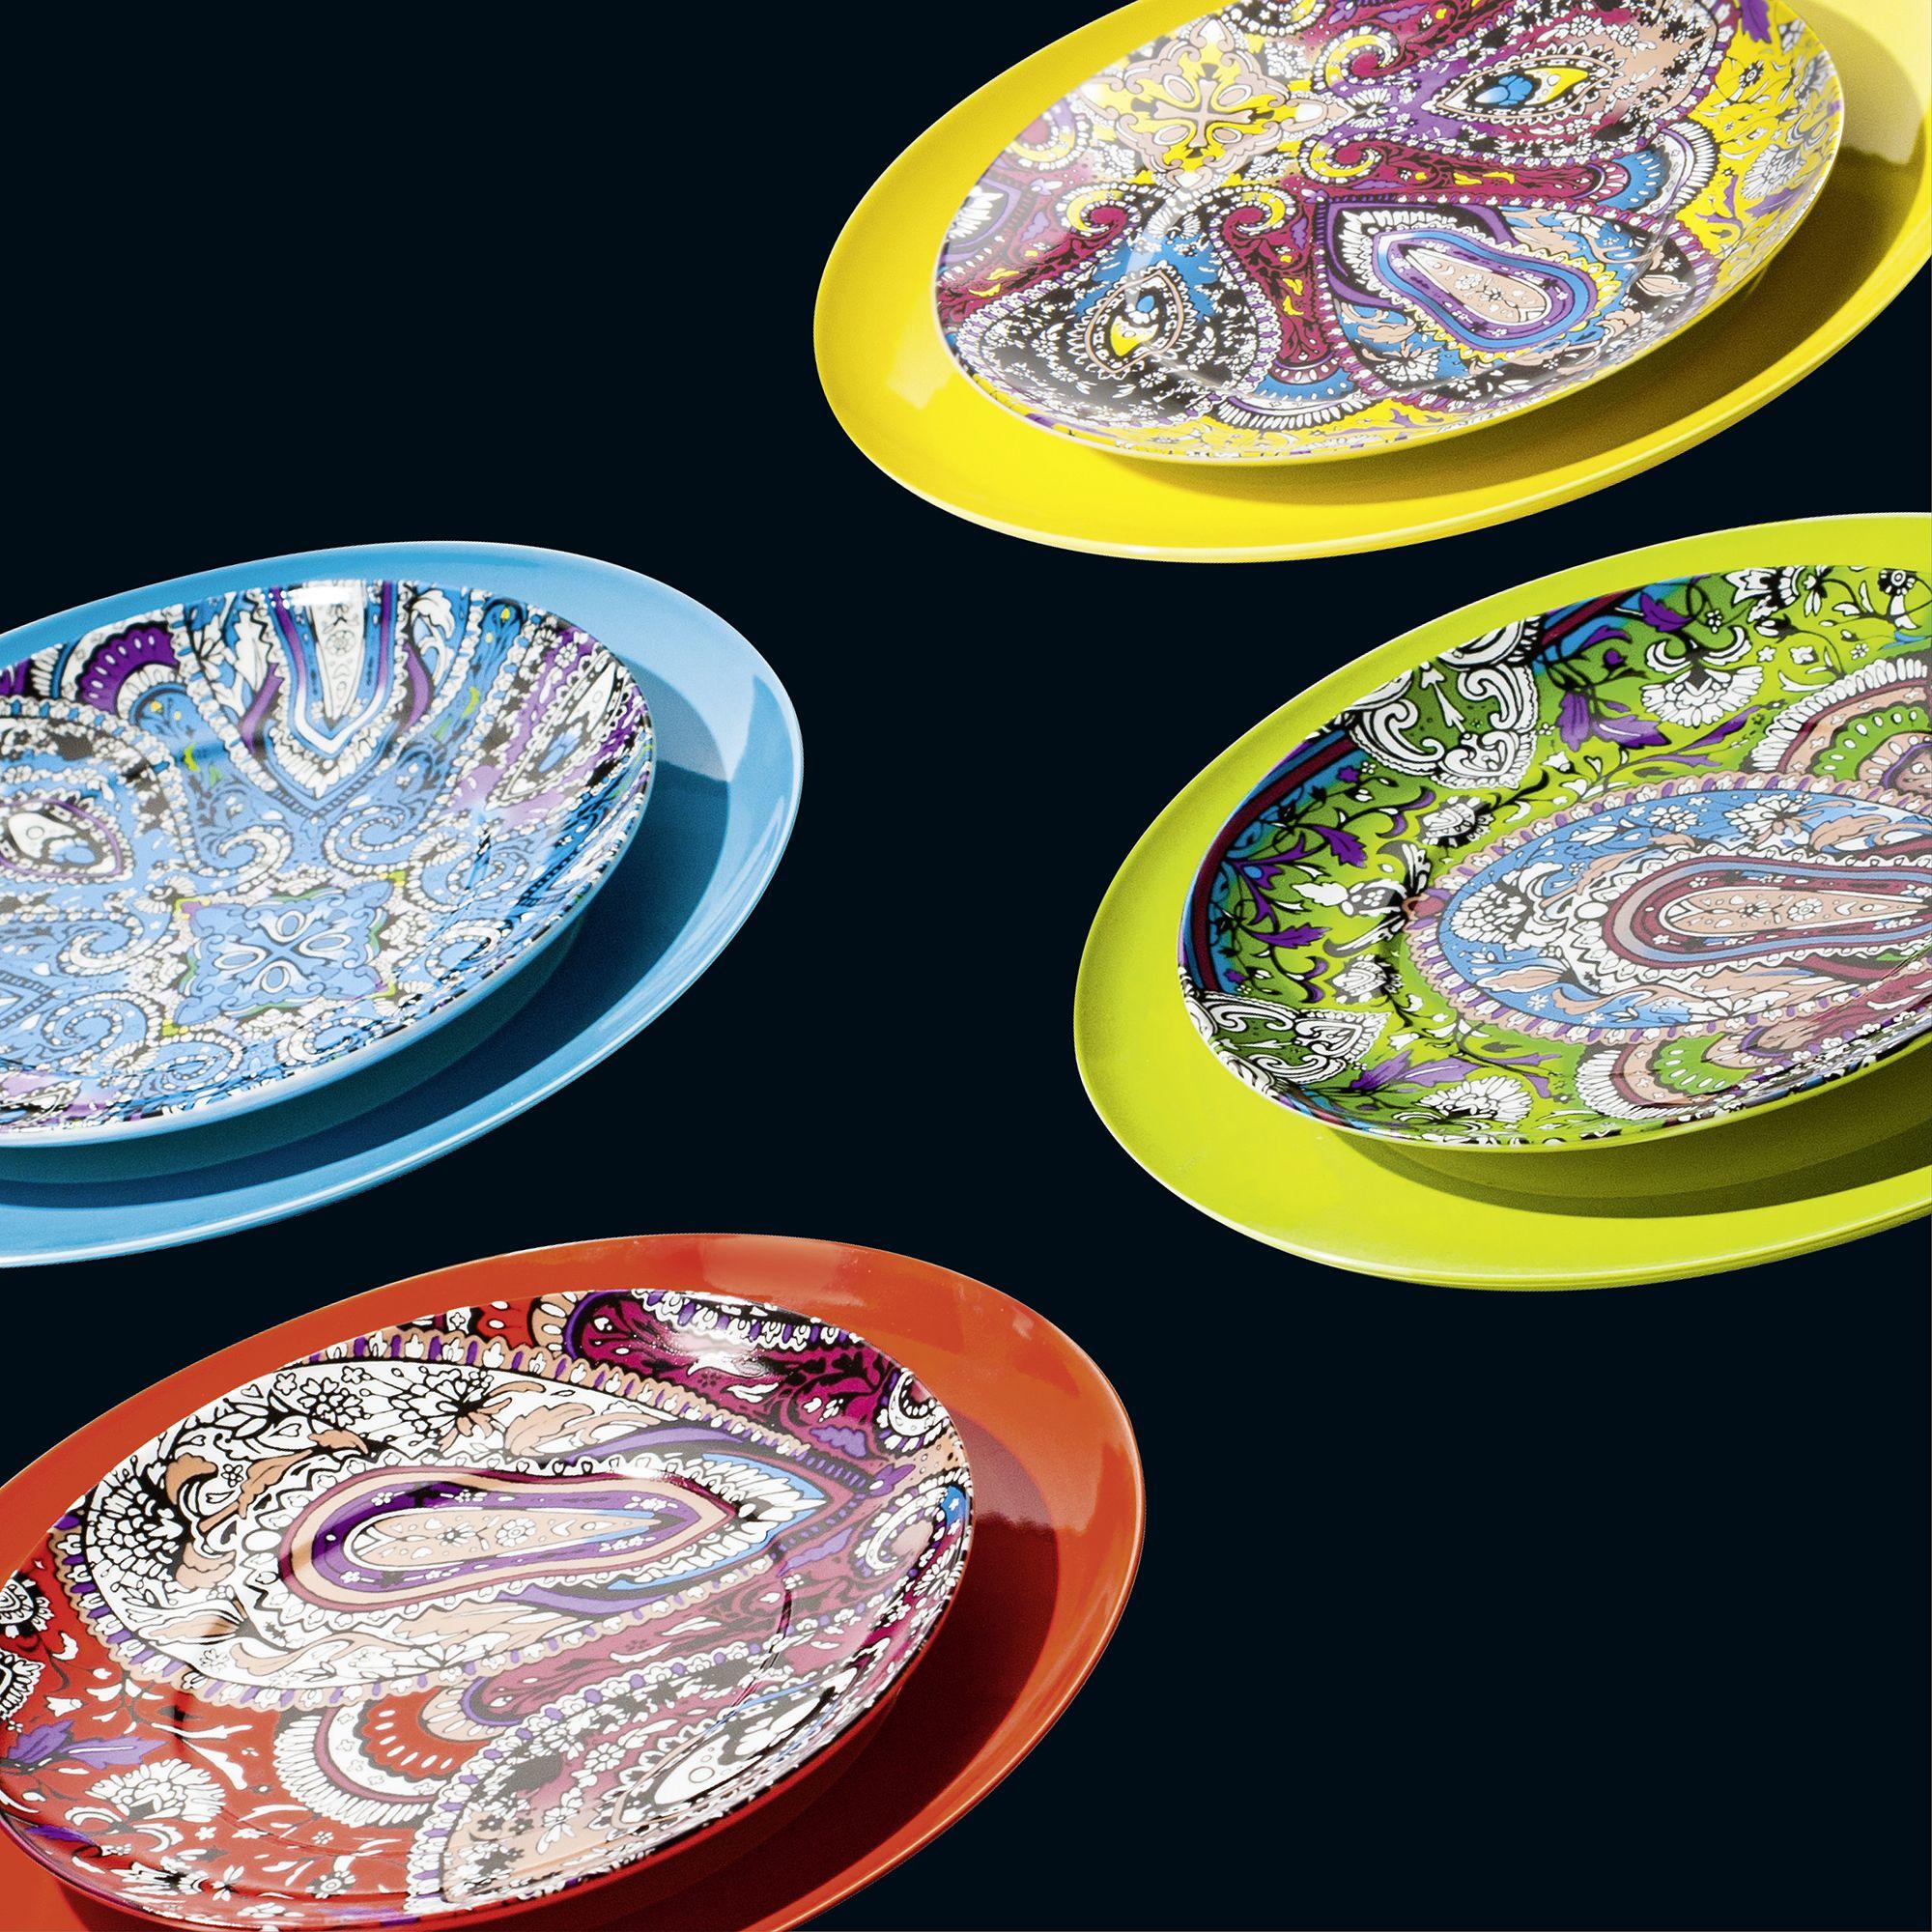 Waechtersbach Urbana Colorful Paisley Accent Plates Porcelain Salad Plates & Waechtersbach Urbana Colorful Paisley Accent Plates Porcelain Salad ...